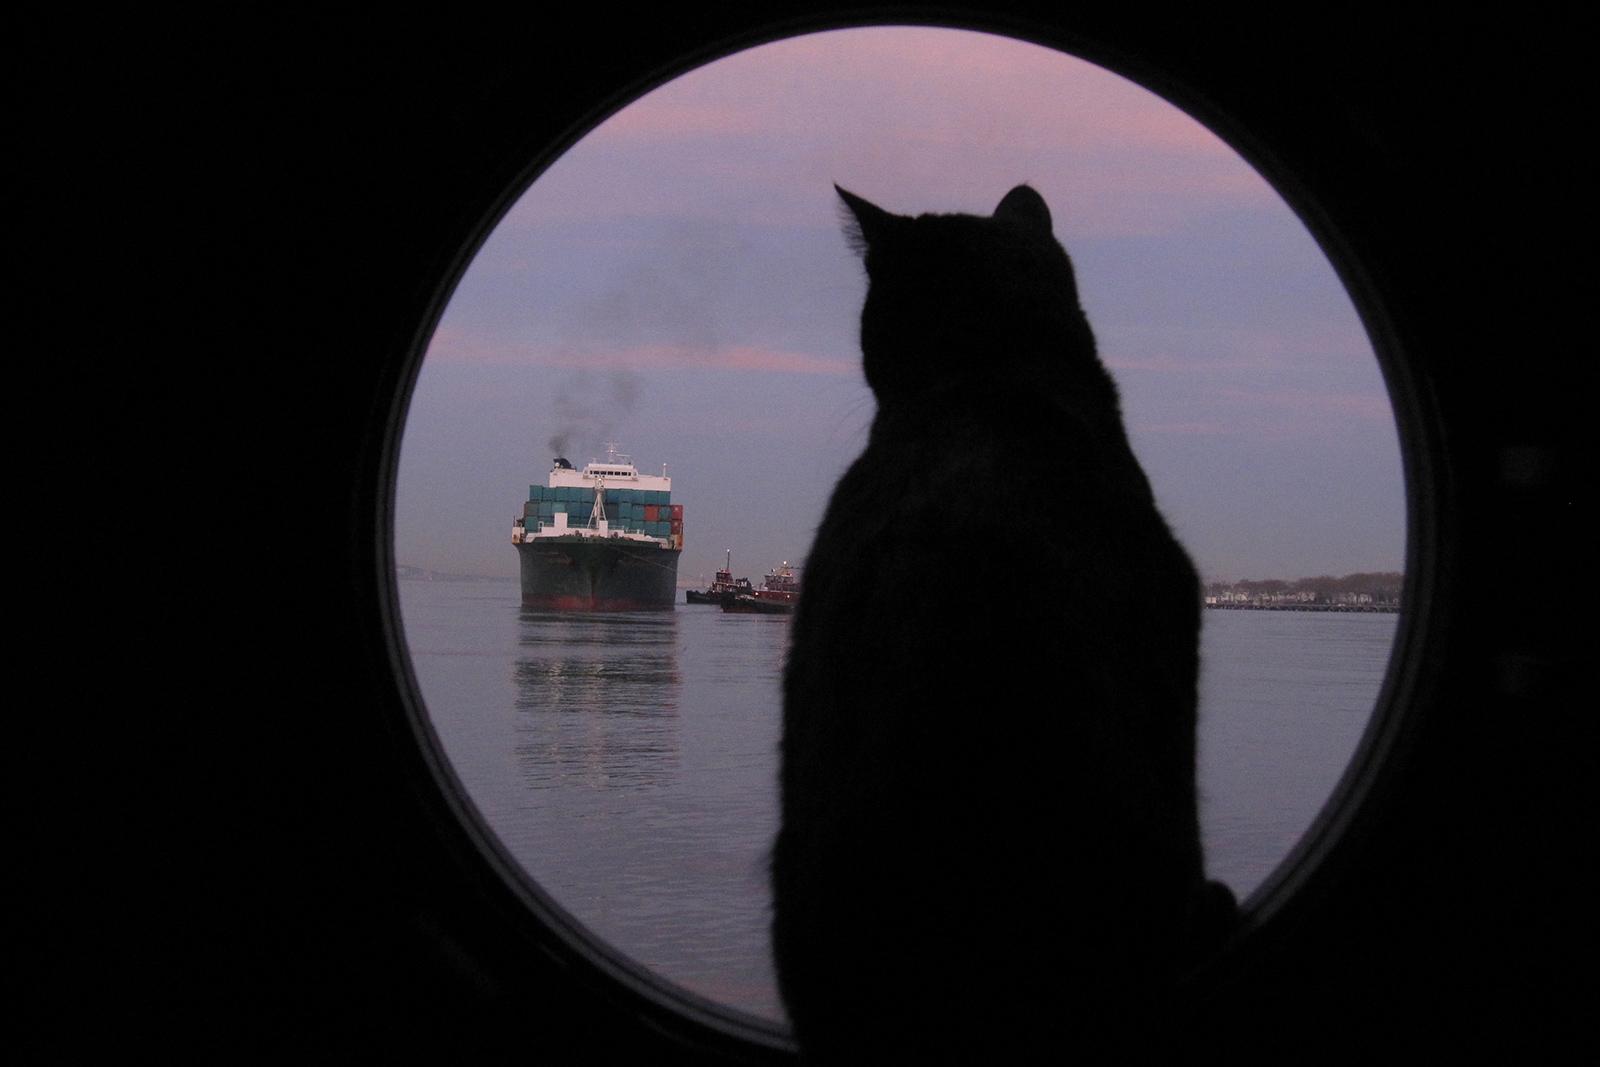 PortSide_ShipCatChiclet_1.jpg